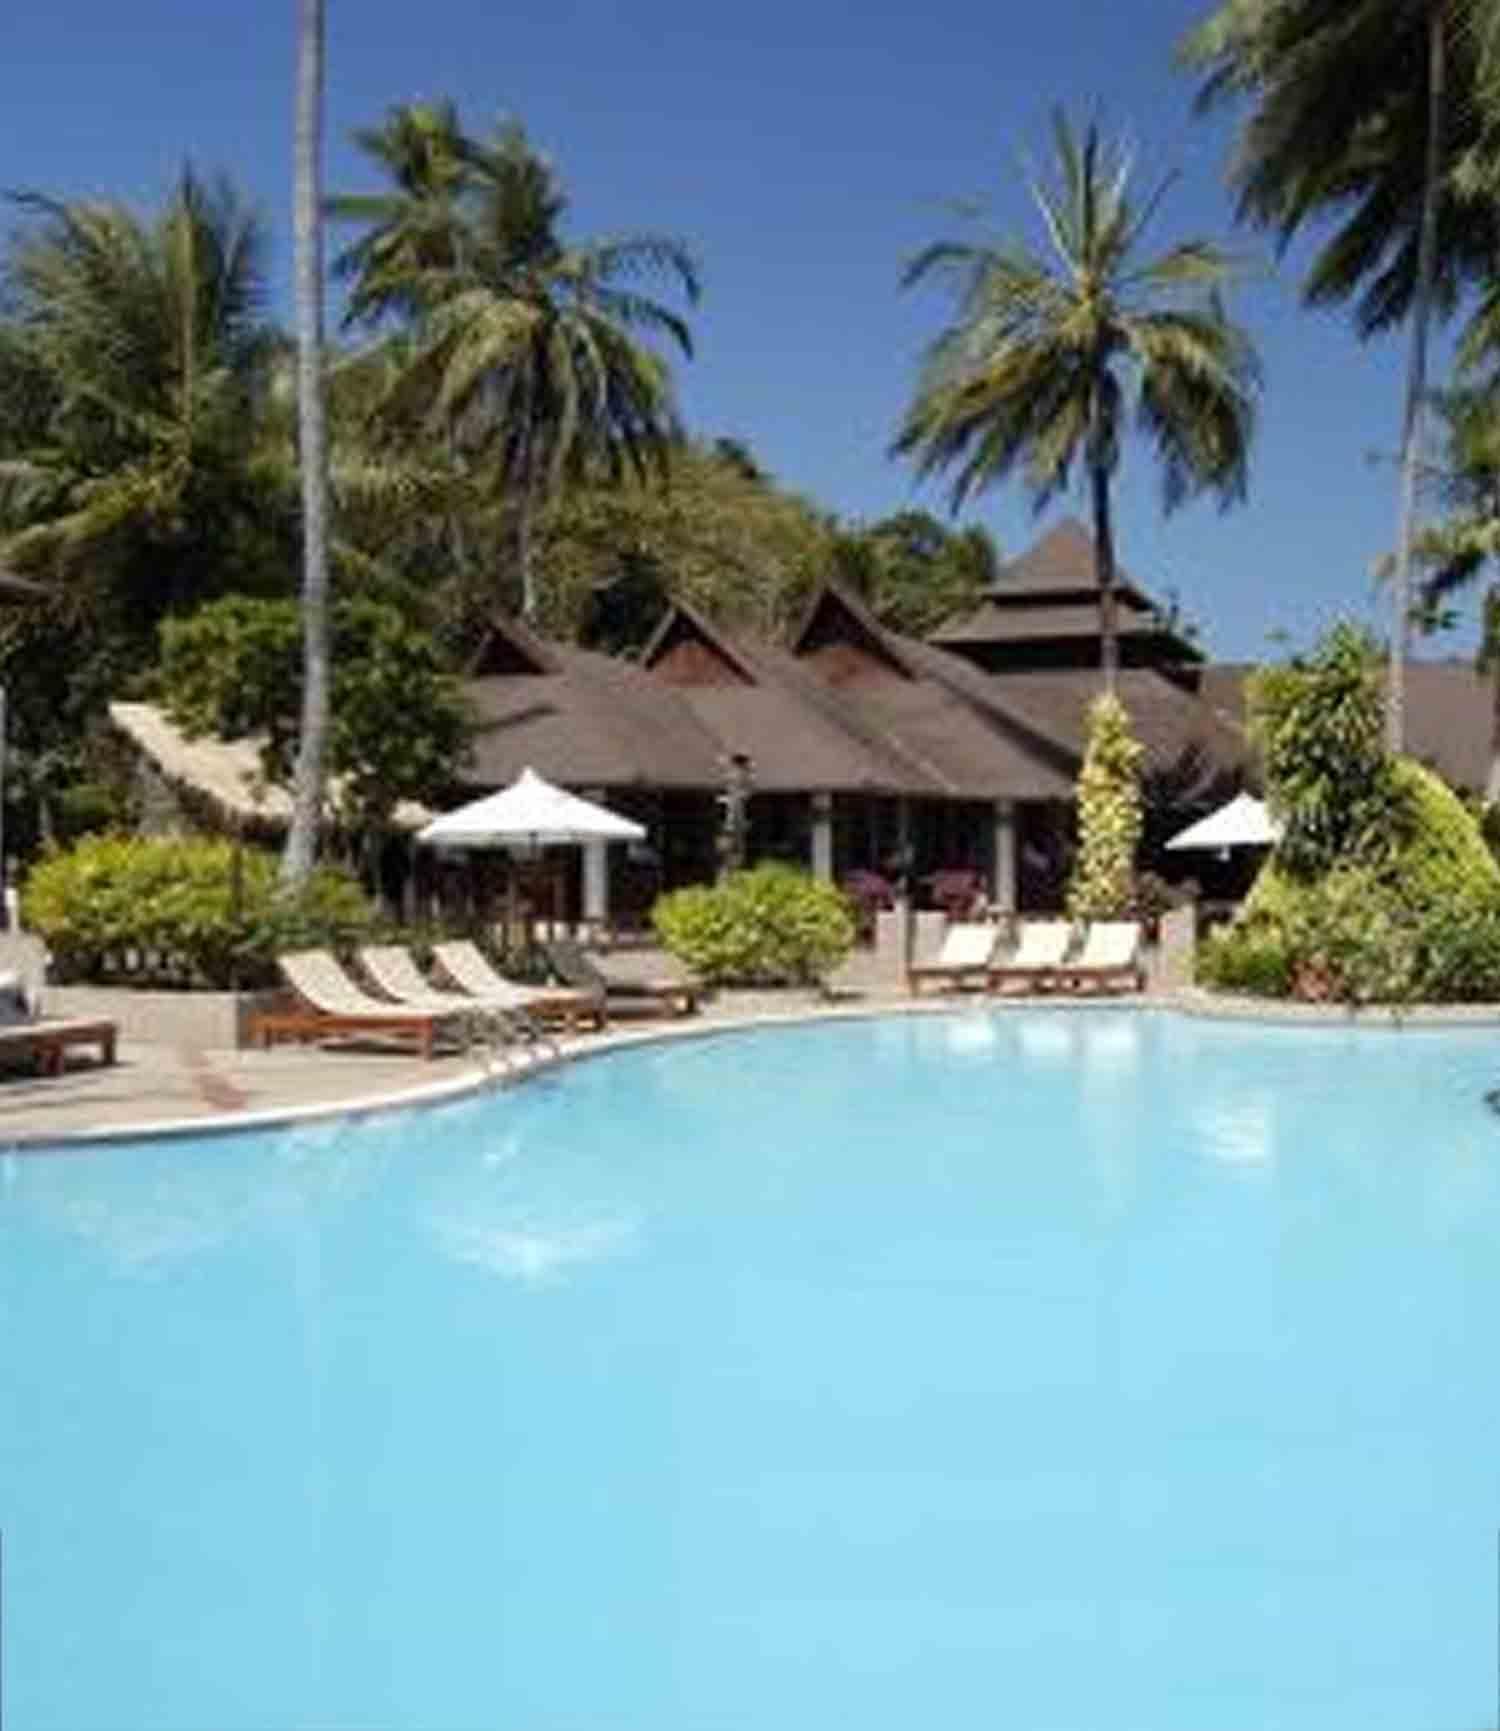 Phi Phi Island Cabana Hotel: Holiday Inn Resort Phi Phi Island